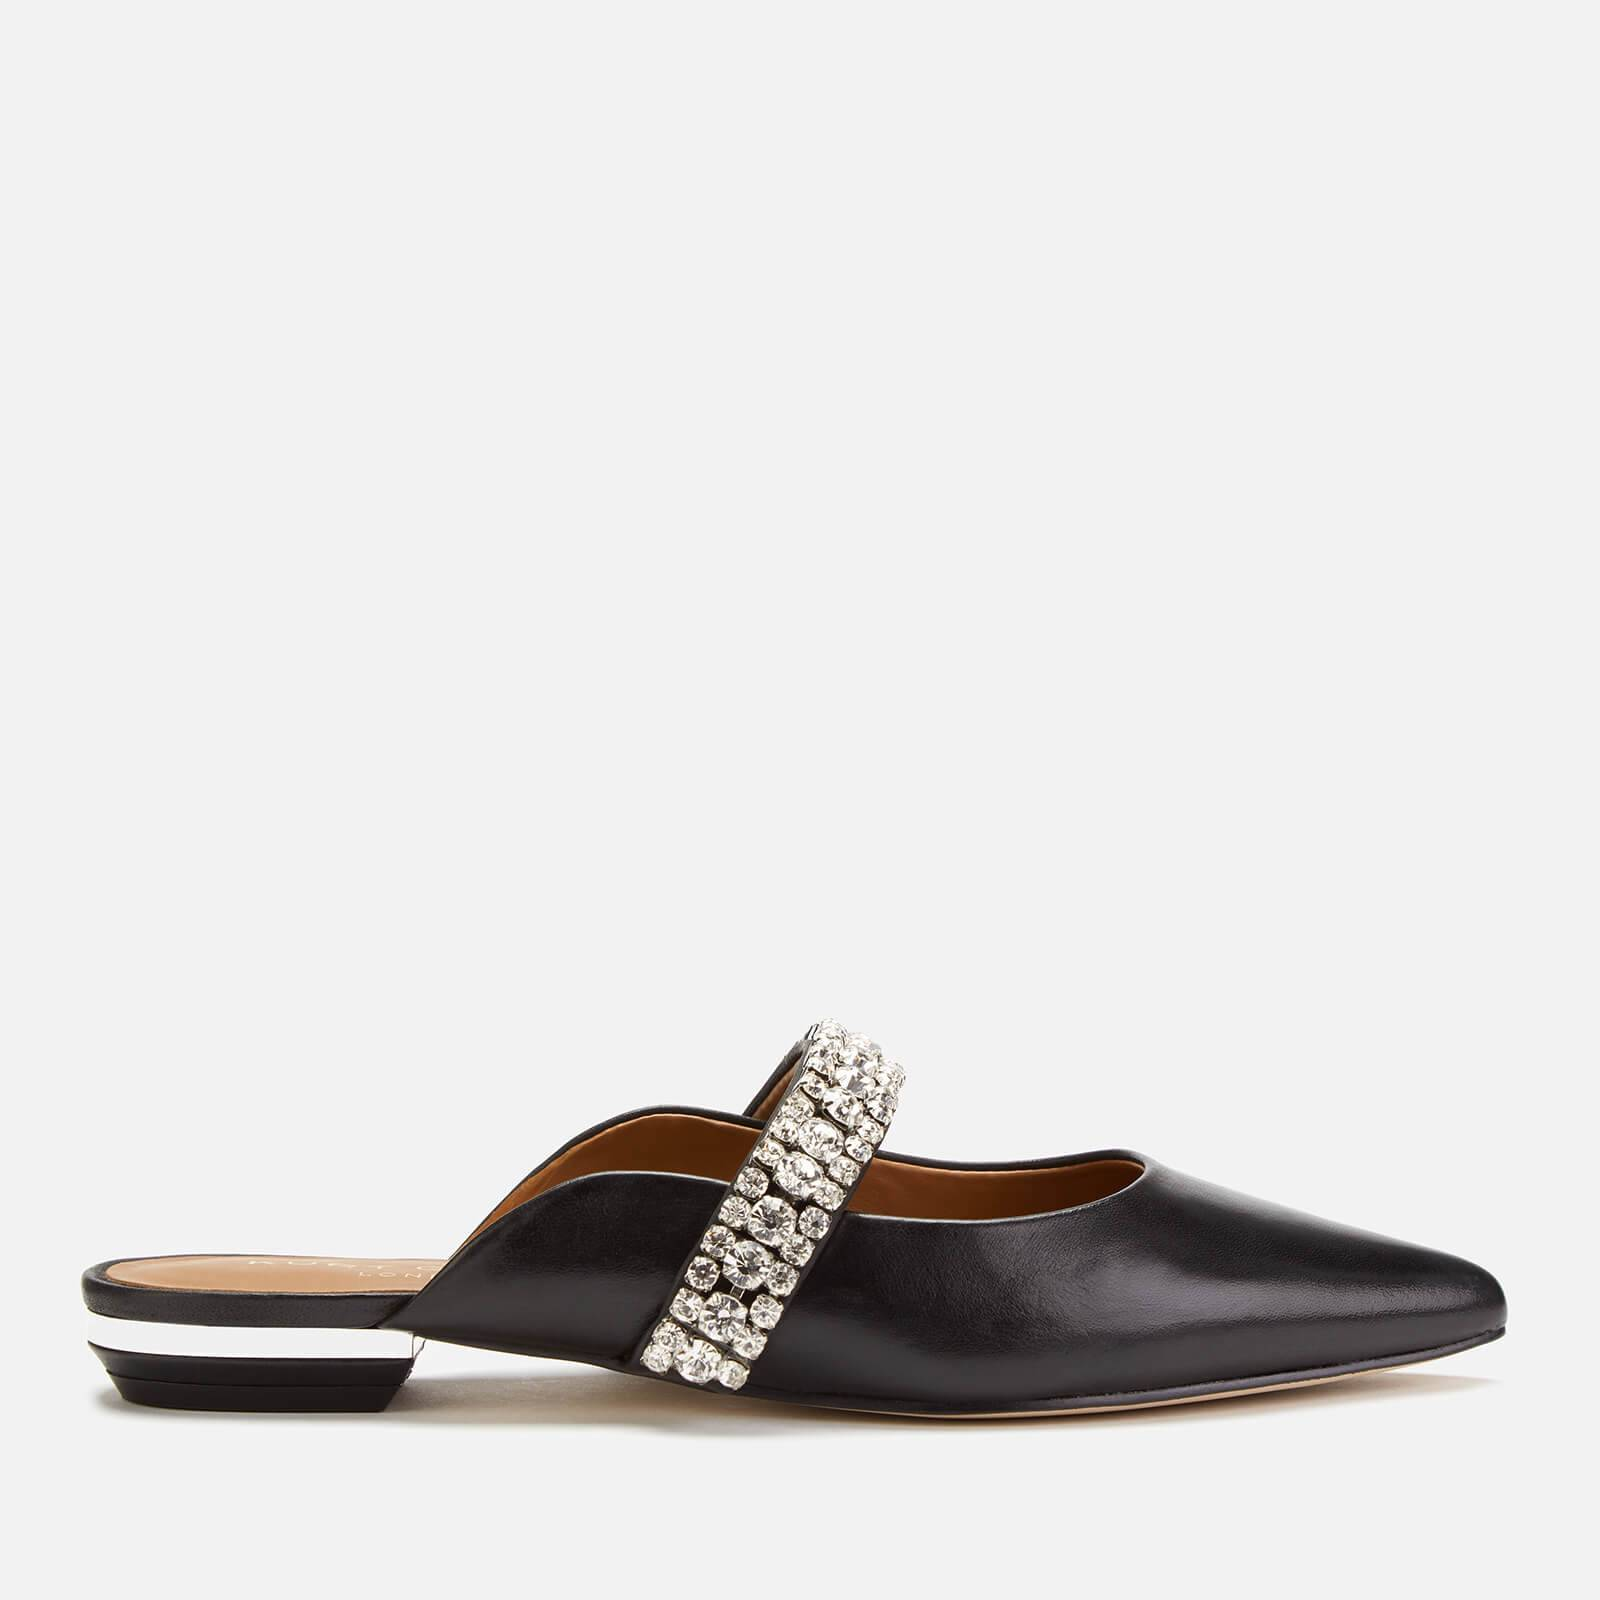 Kurt Geiger London Women's Princely Leather Flat Mules - Black - UK 5 - Black